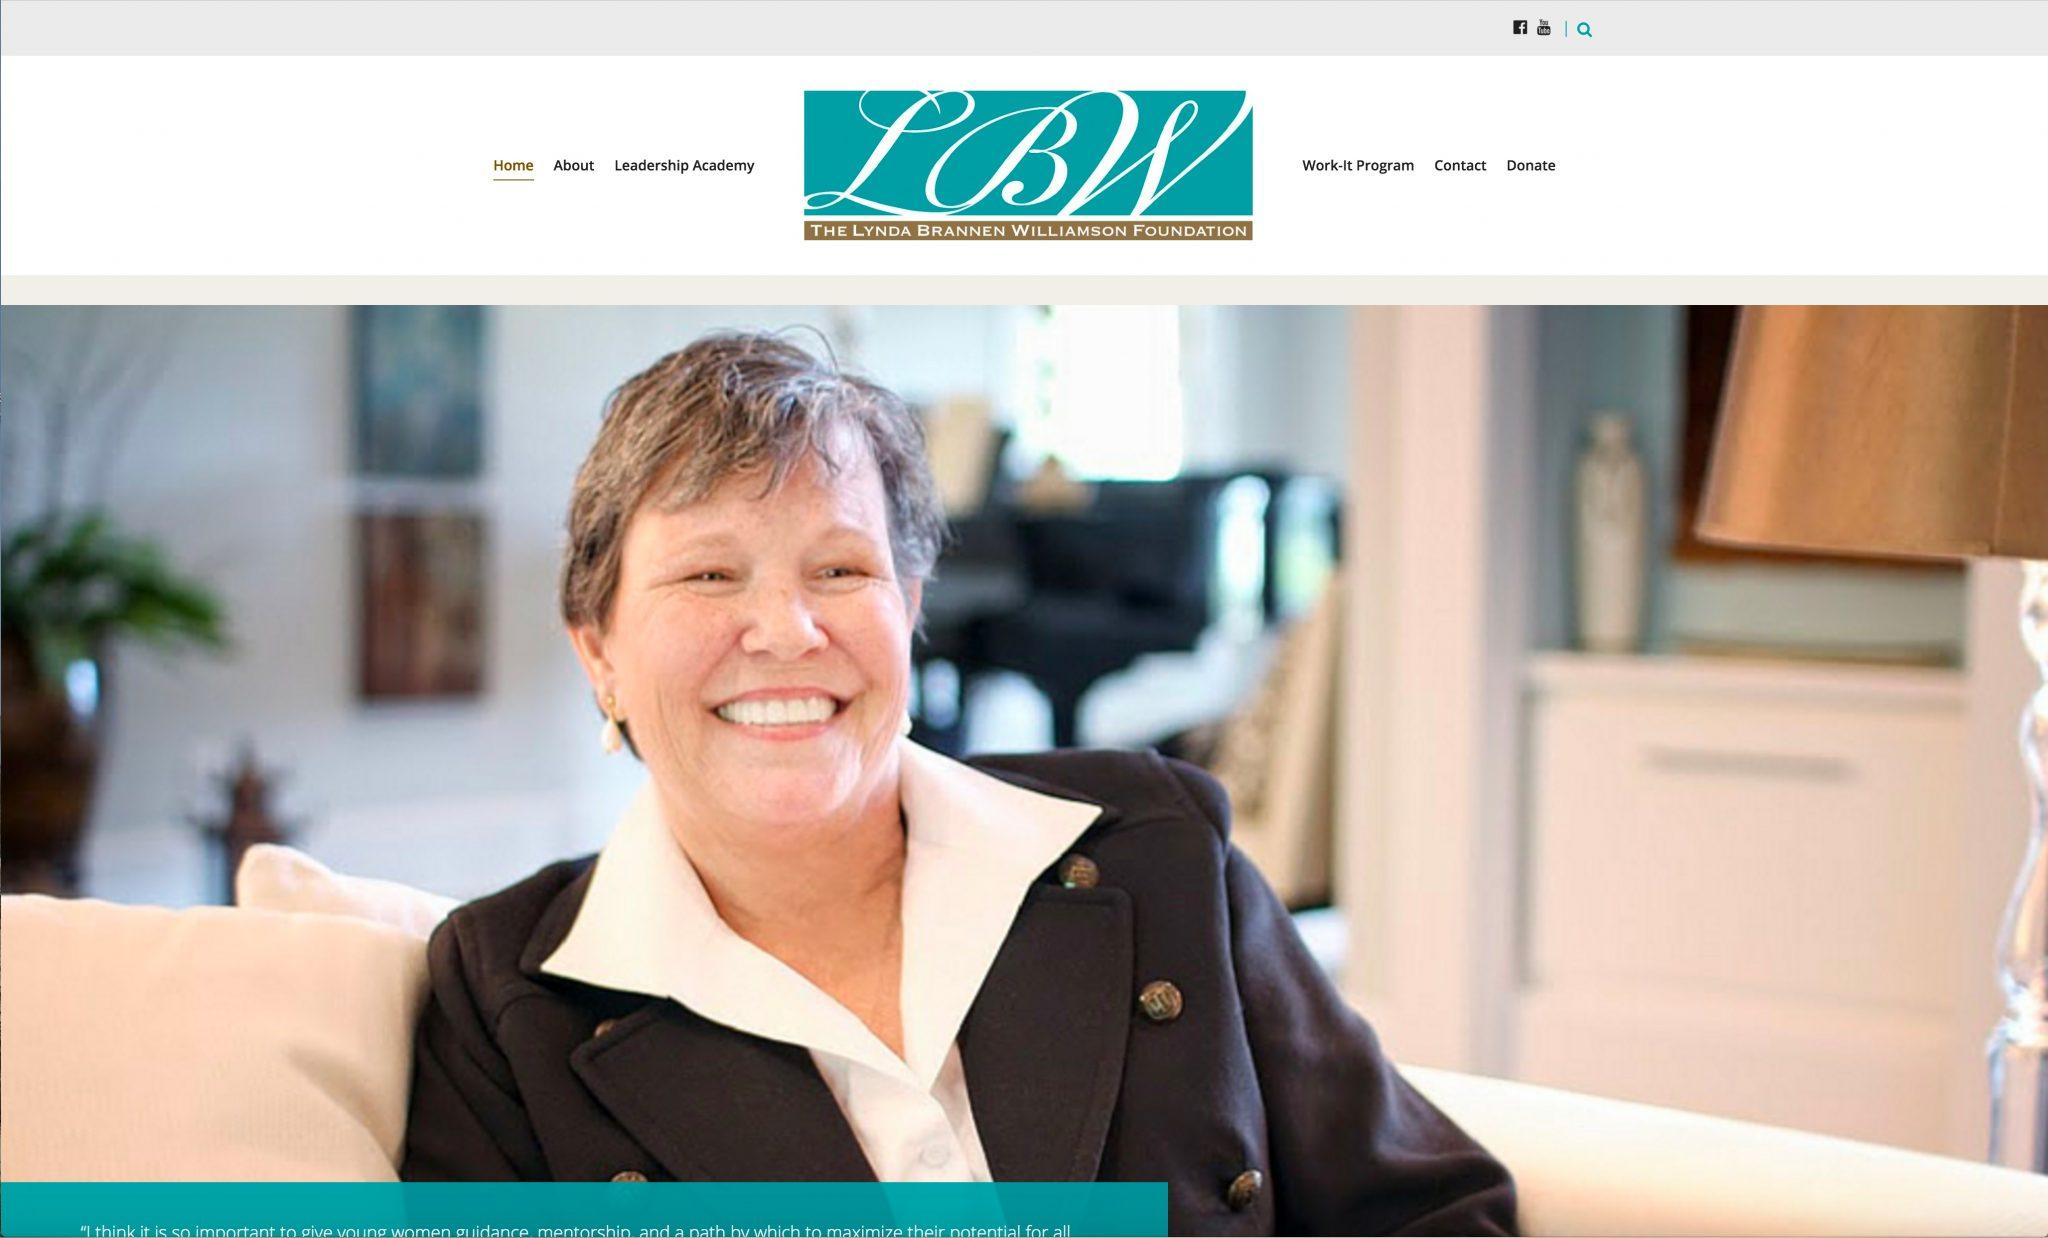 The Lynda Brannen Williamson Foundation